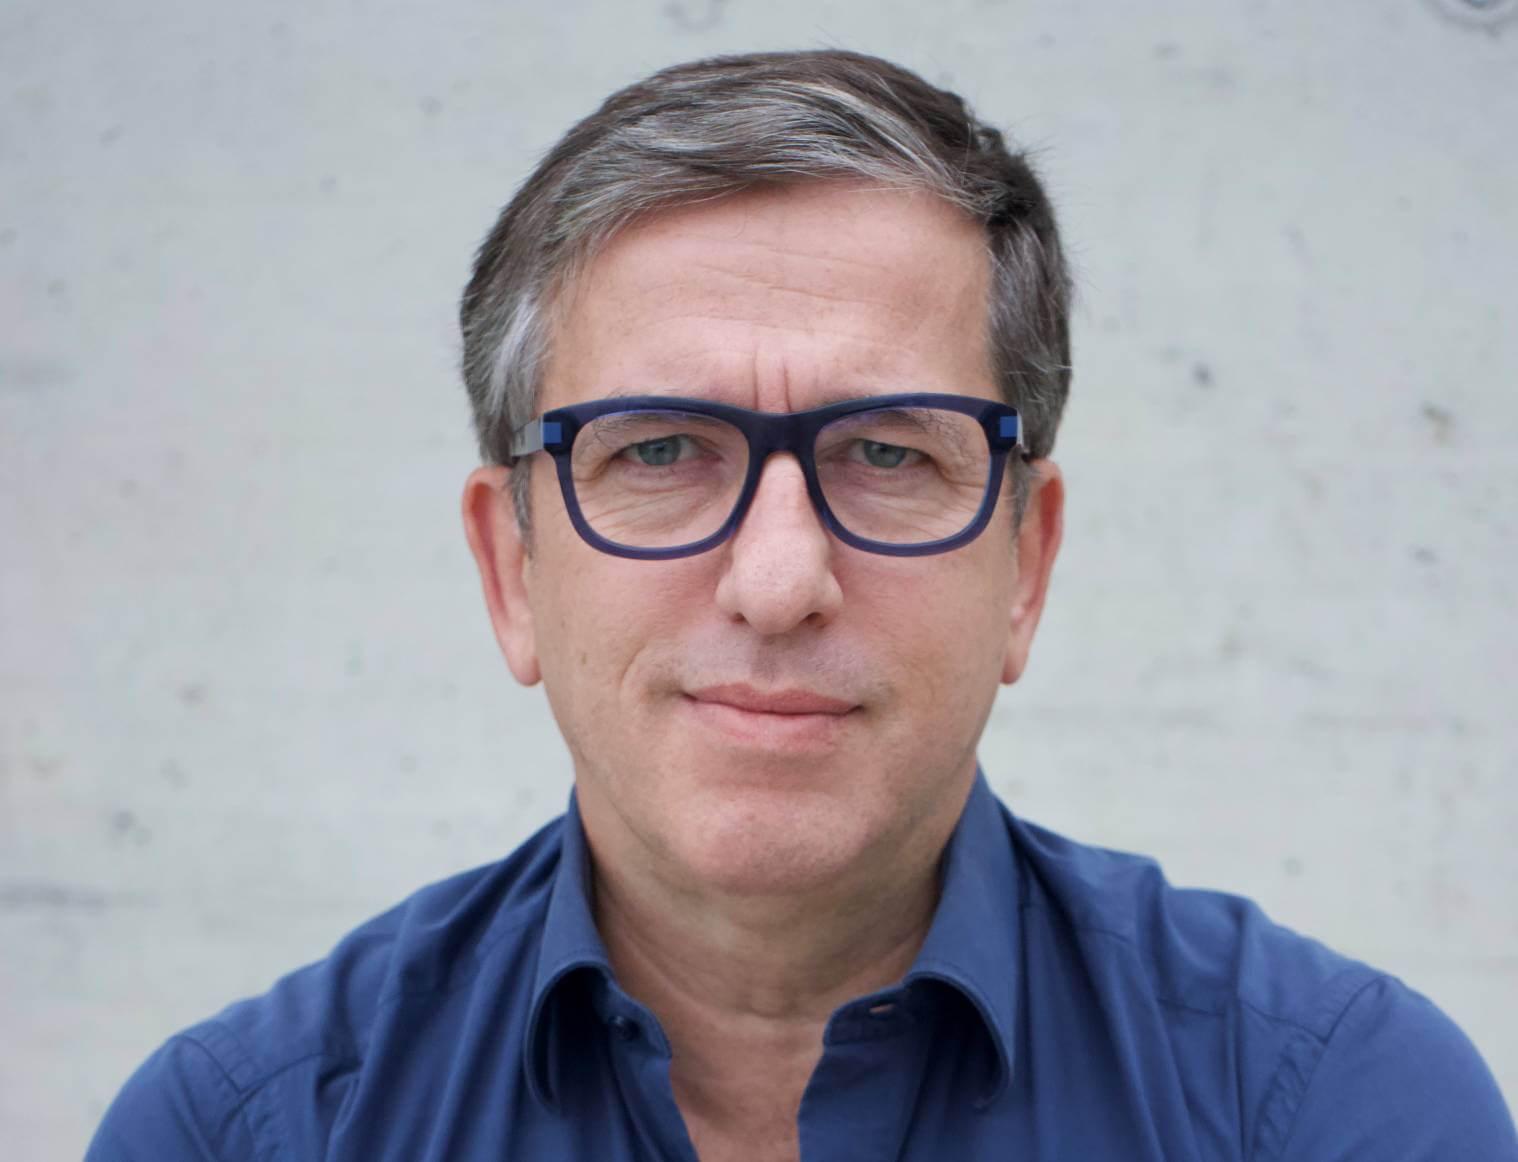 Spiros Margaris on the World of Fintech